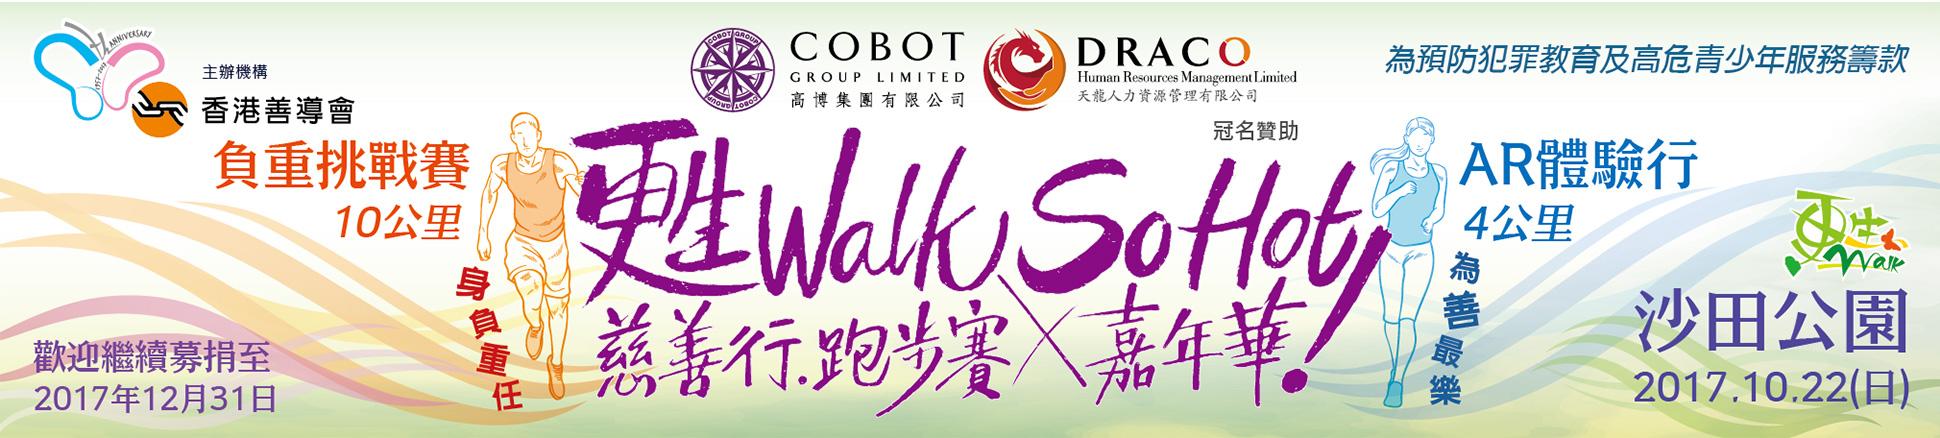 SRACP Charity Walk & Run 2017